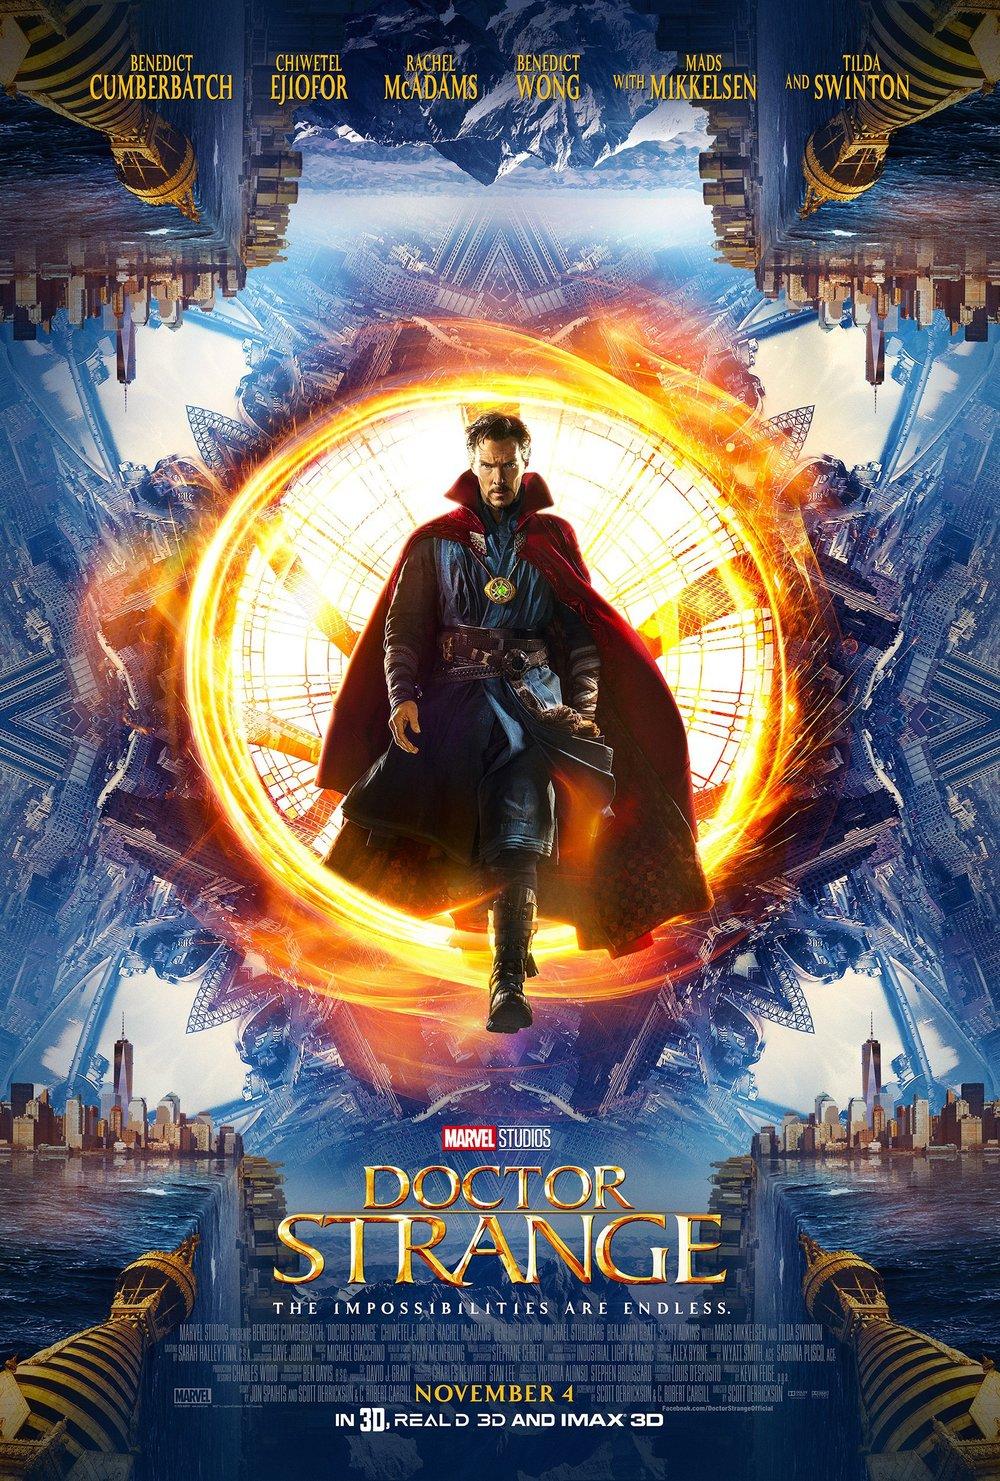 doctor-strange-movie-poster-marvel-cinematic-universe-1038908.jpg